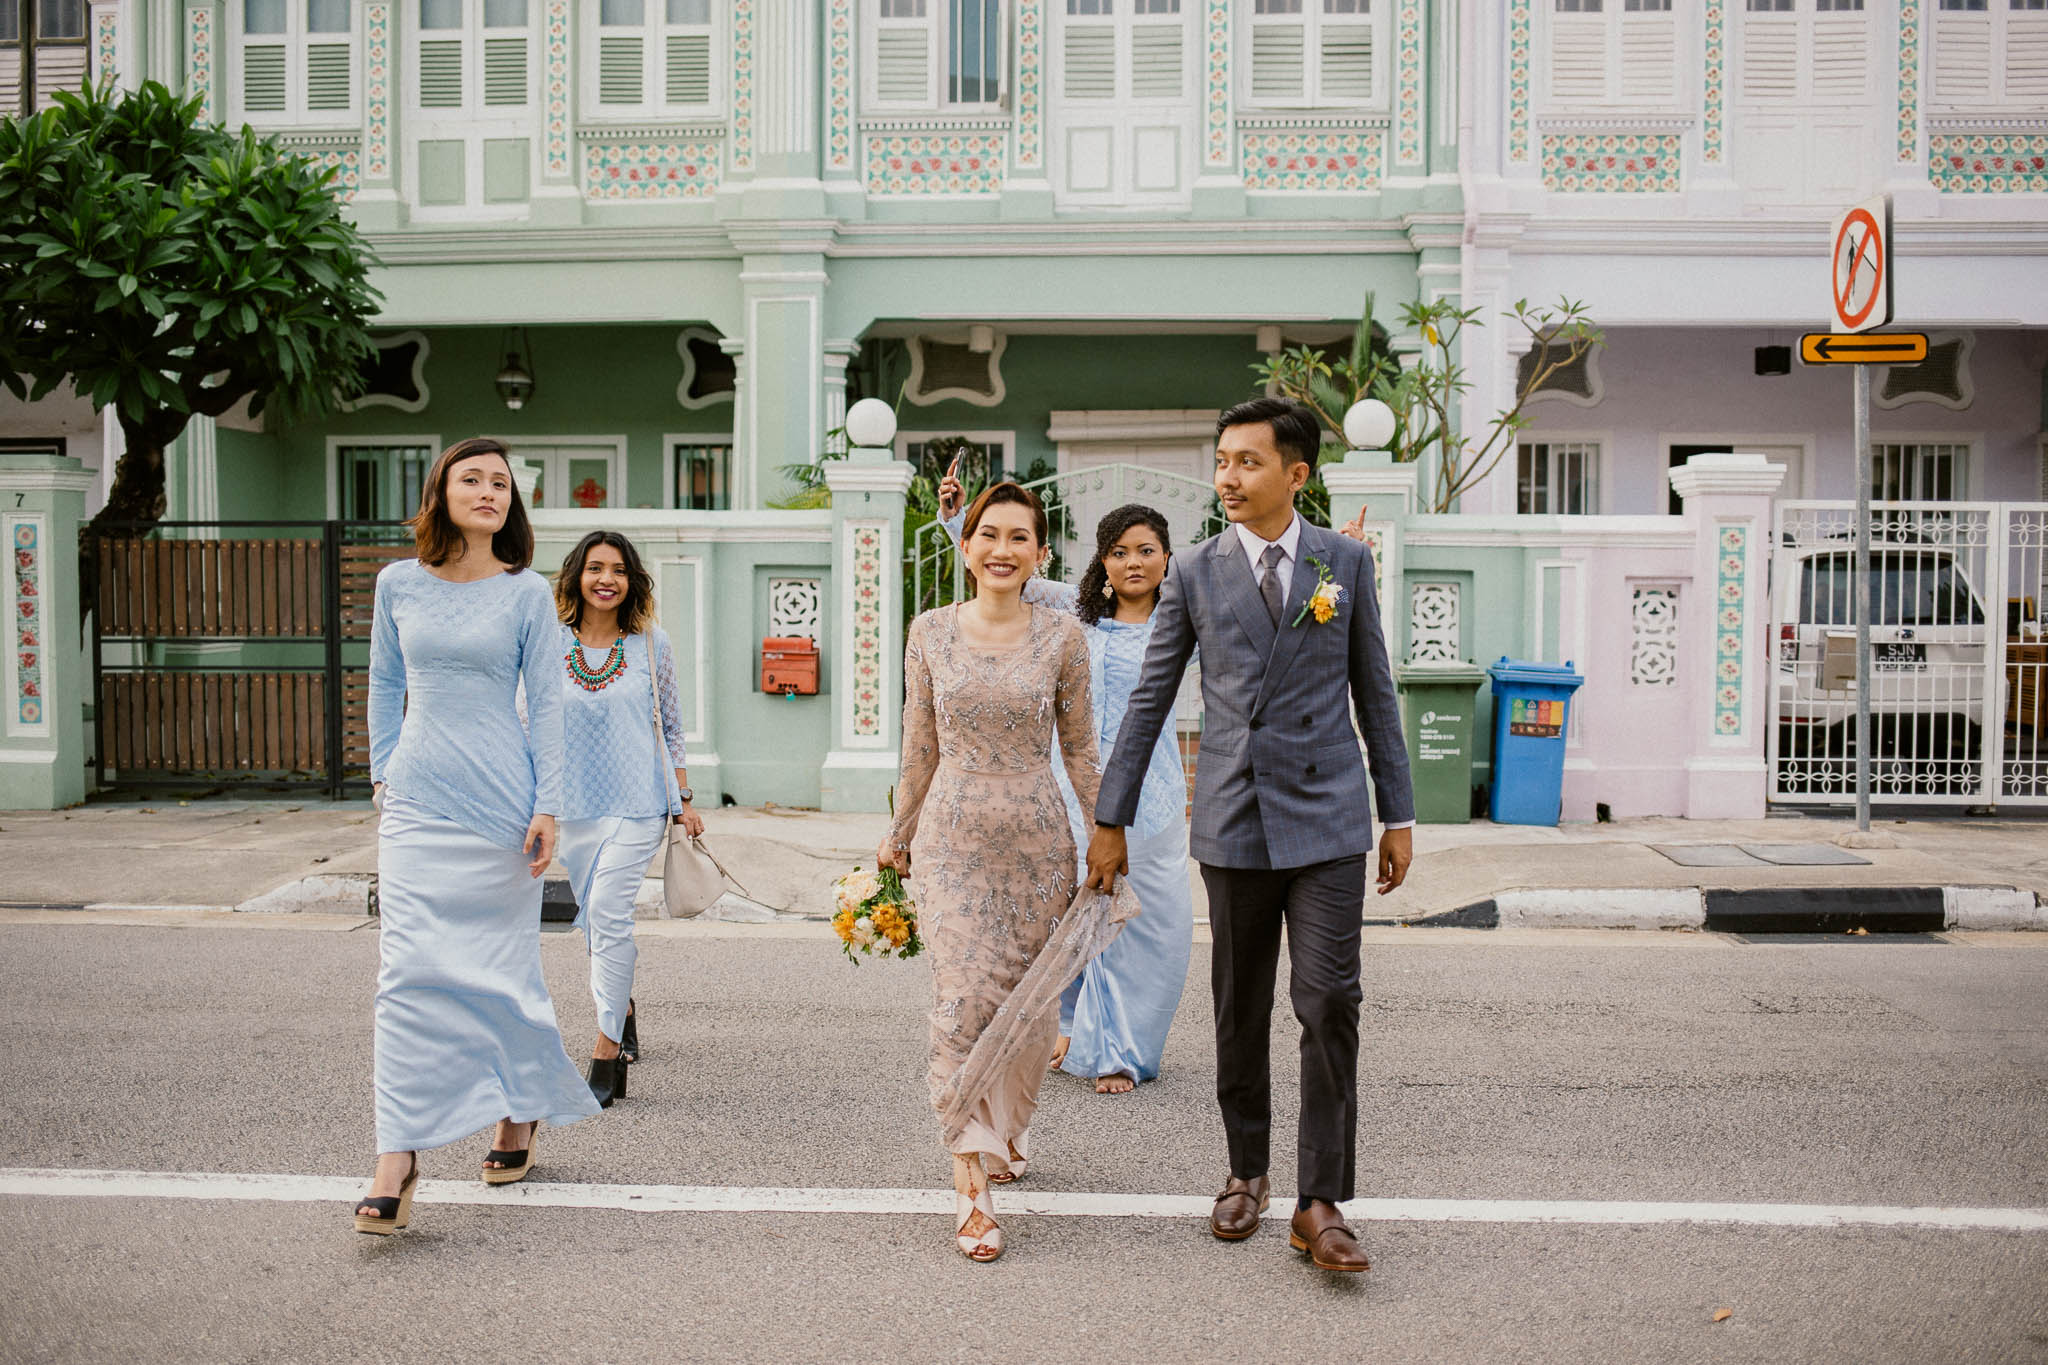 singapore-wedding-photographer-wedding-nufail-addafiq-080.jpg